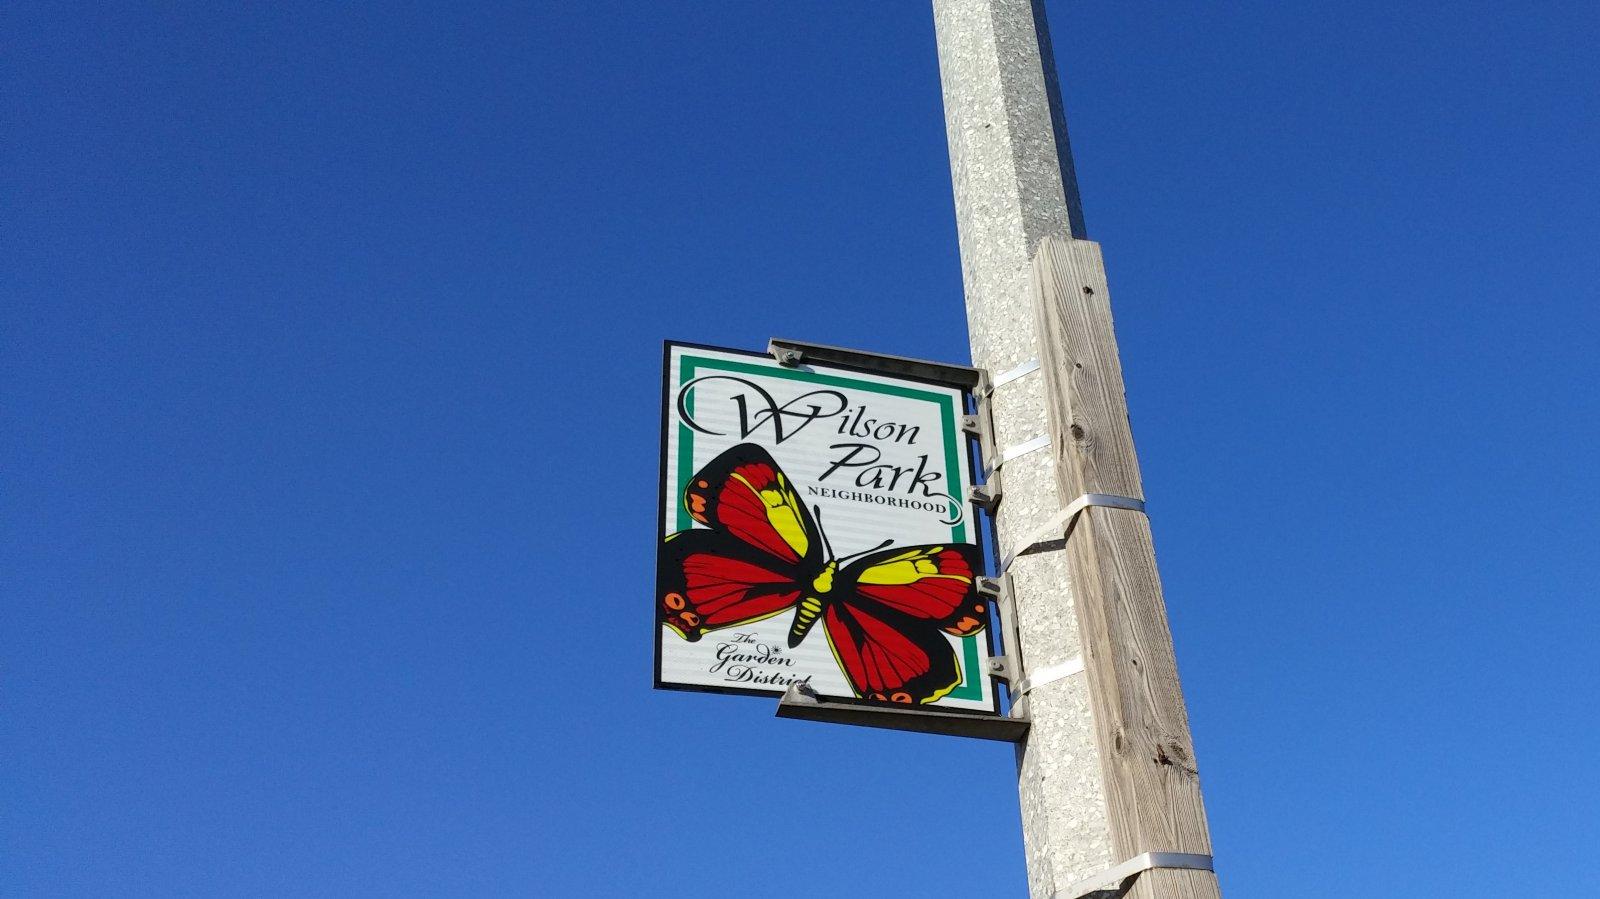 Wilson Park Neighborhood sign